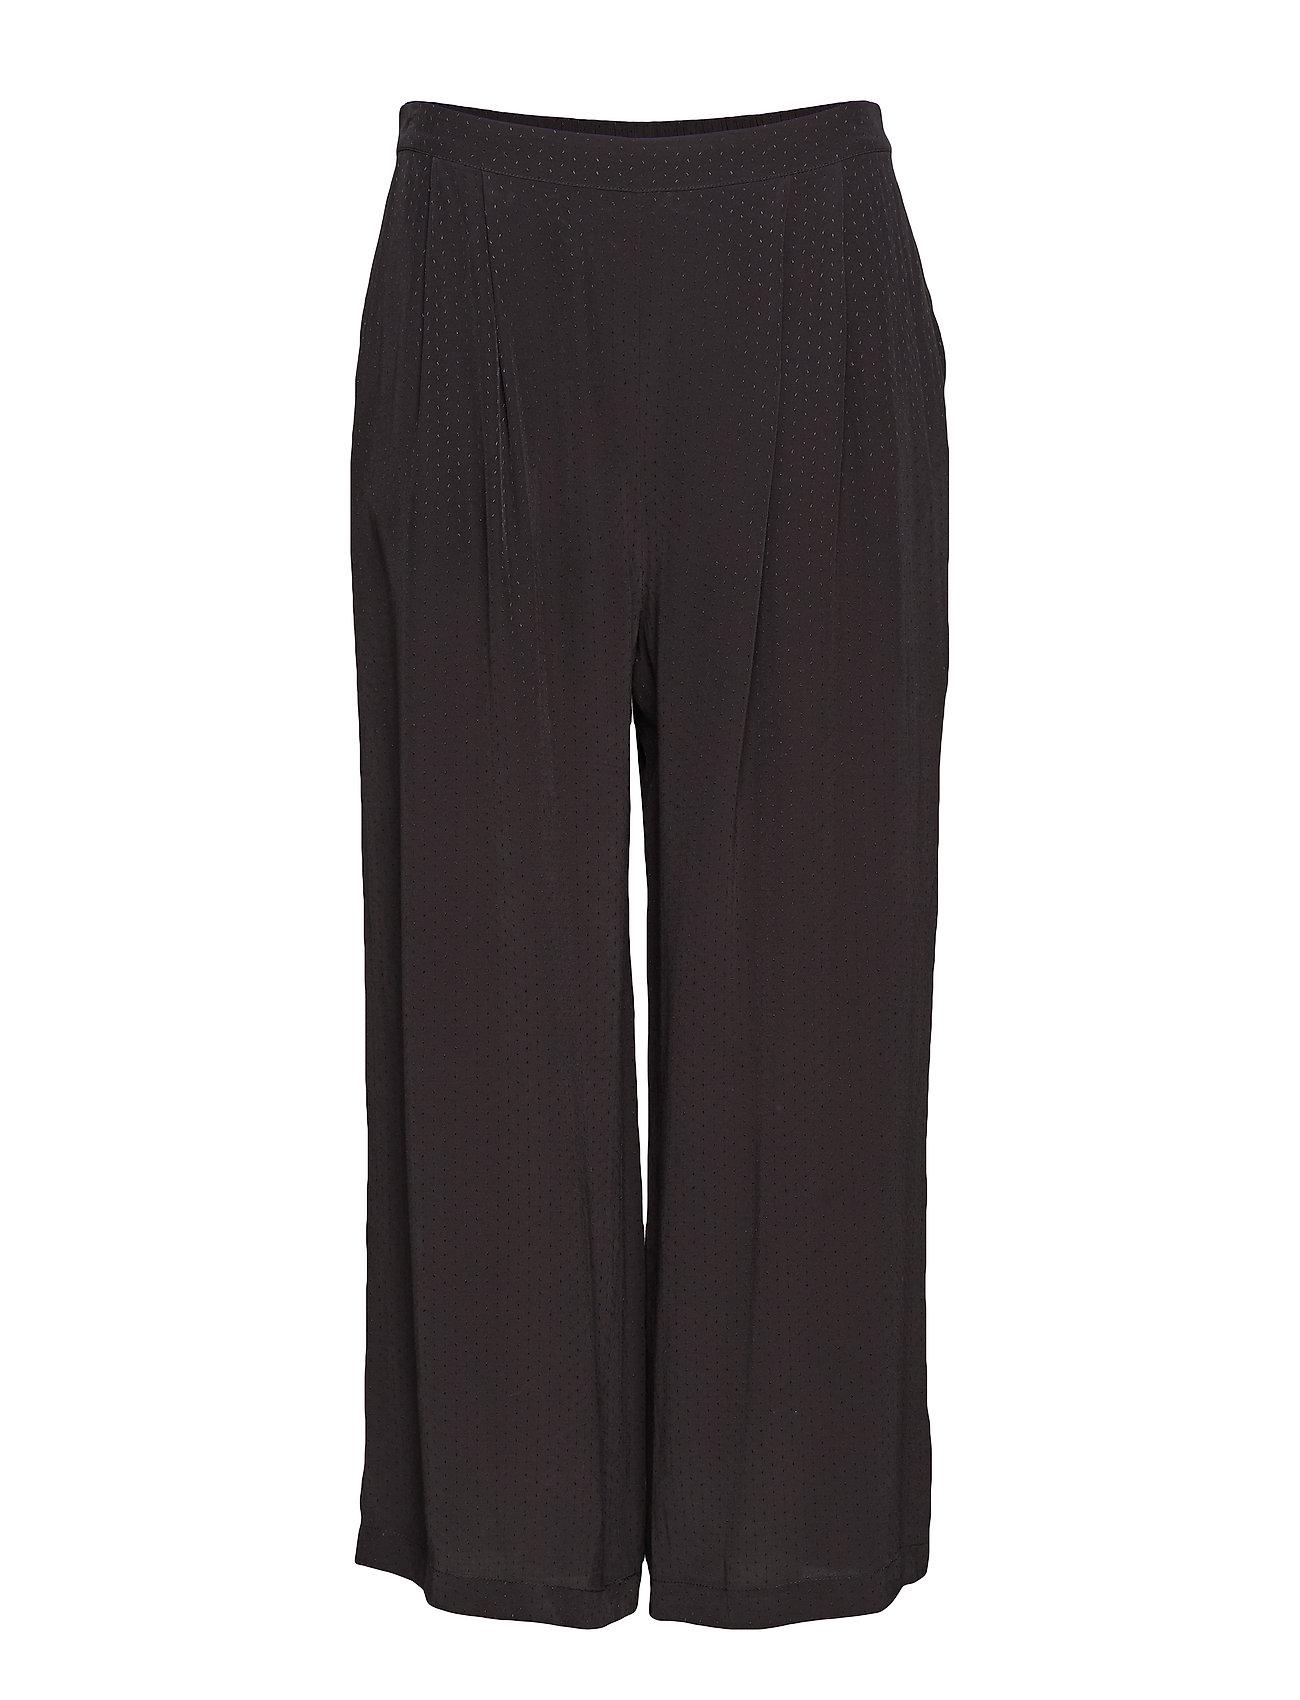 Samsøe & Samsøe Ganda trousers 10458 - BLACK